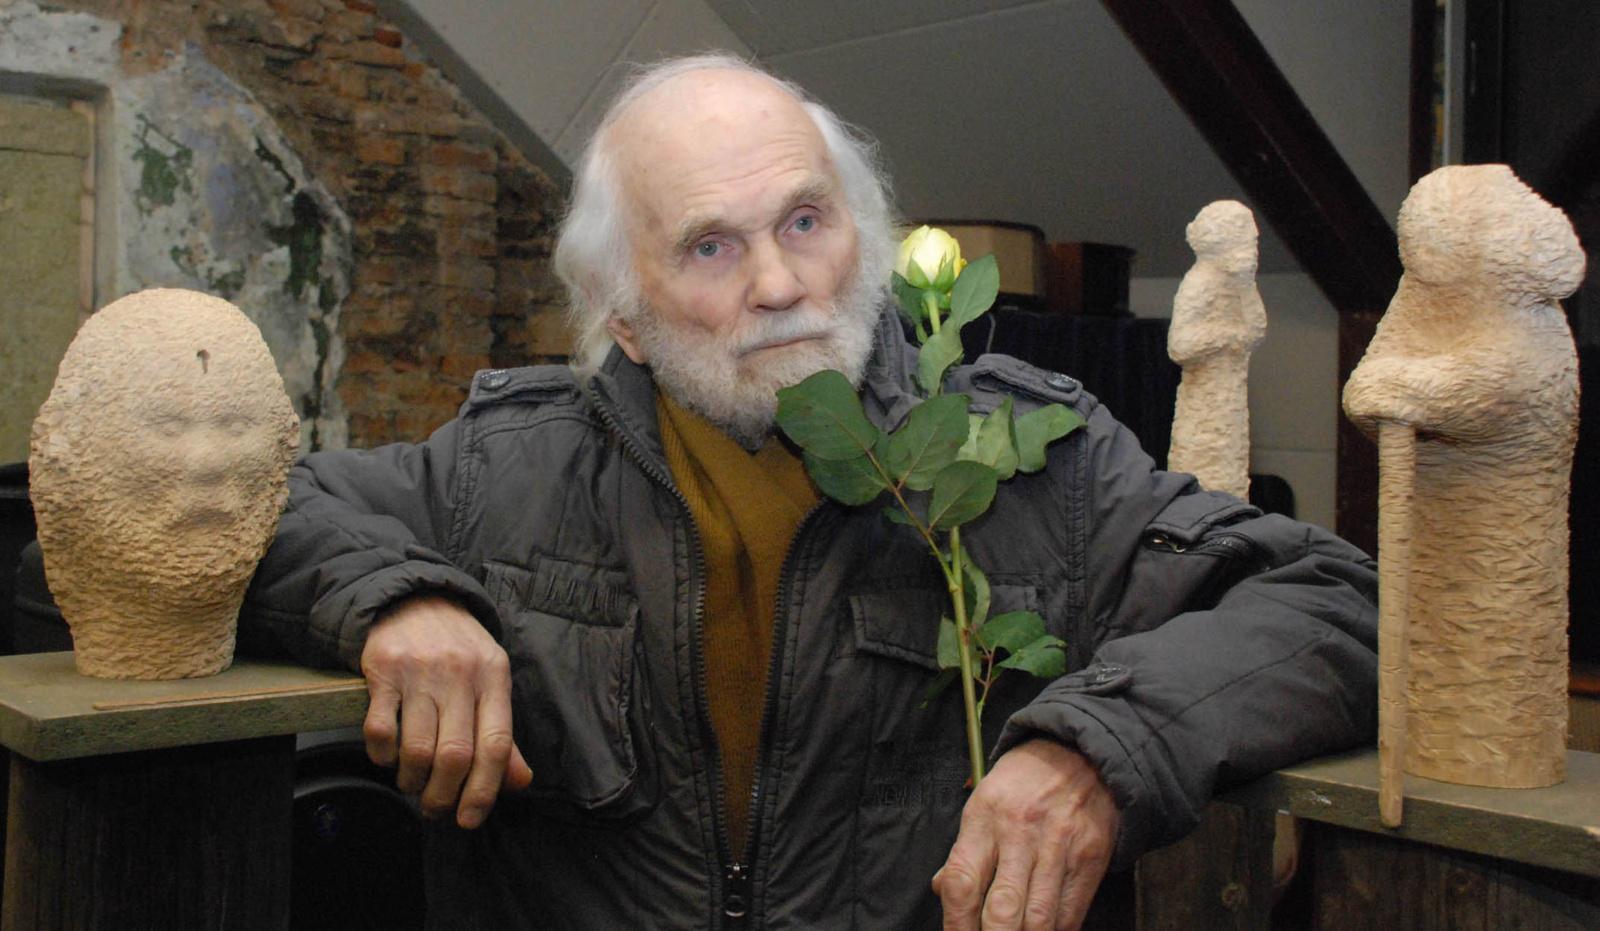 Premjeras sveikina skulptorių L. Striogą 90-ojo jubiliejaus proga